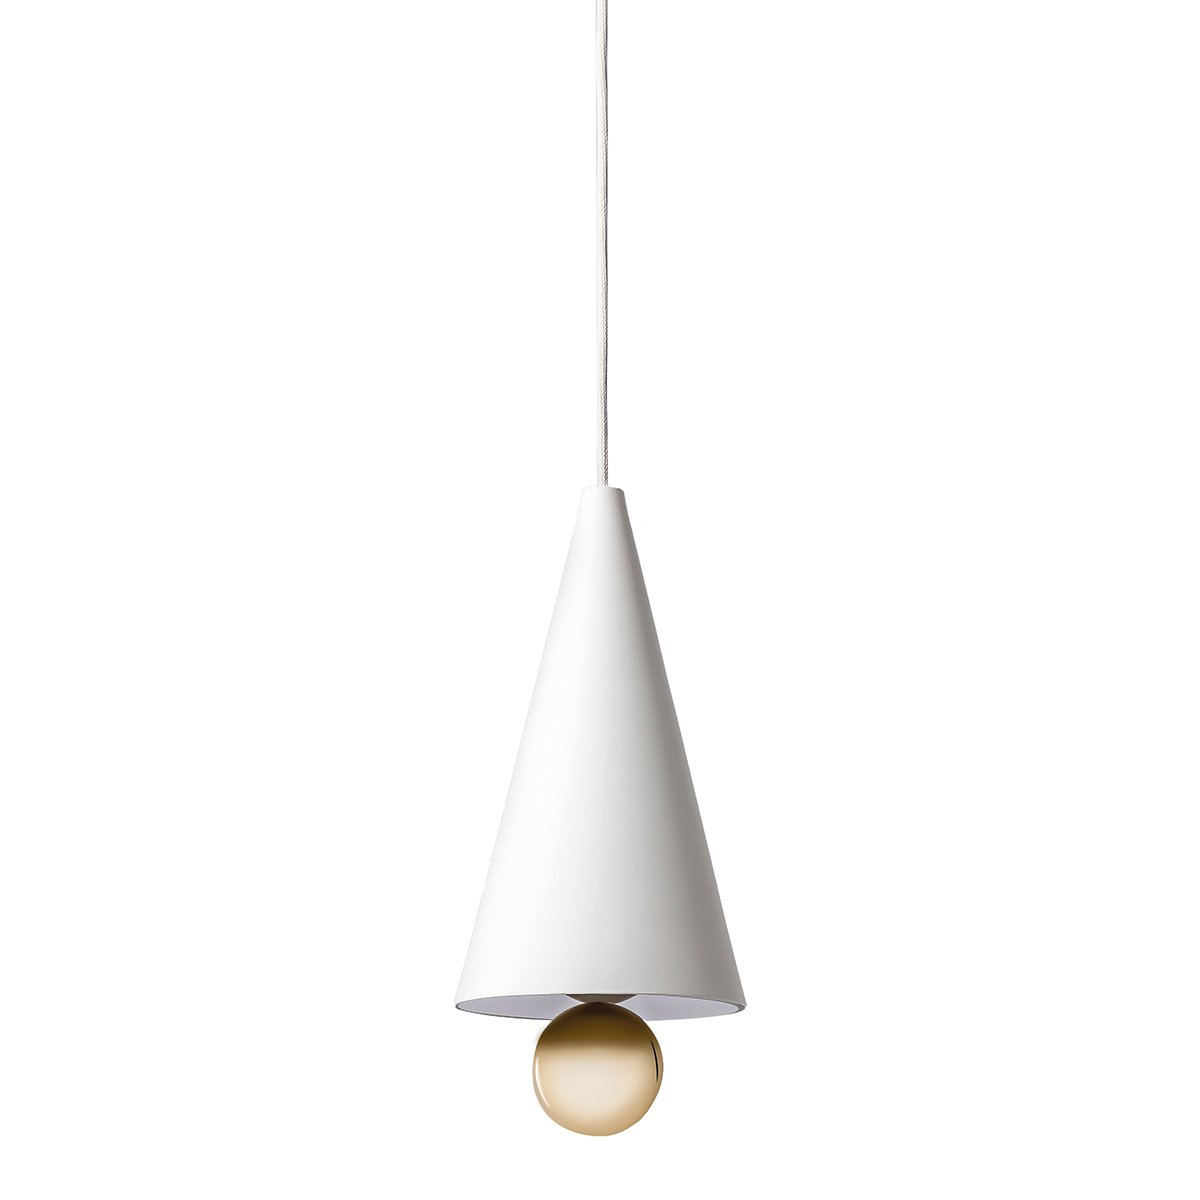 Petite Friture Cherry Hanglamp - Small/White-Gold